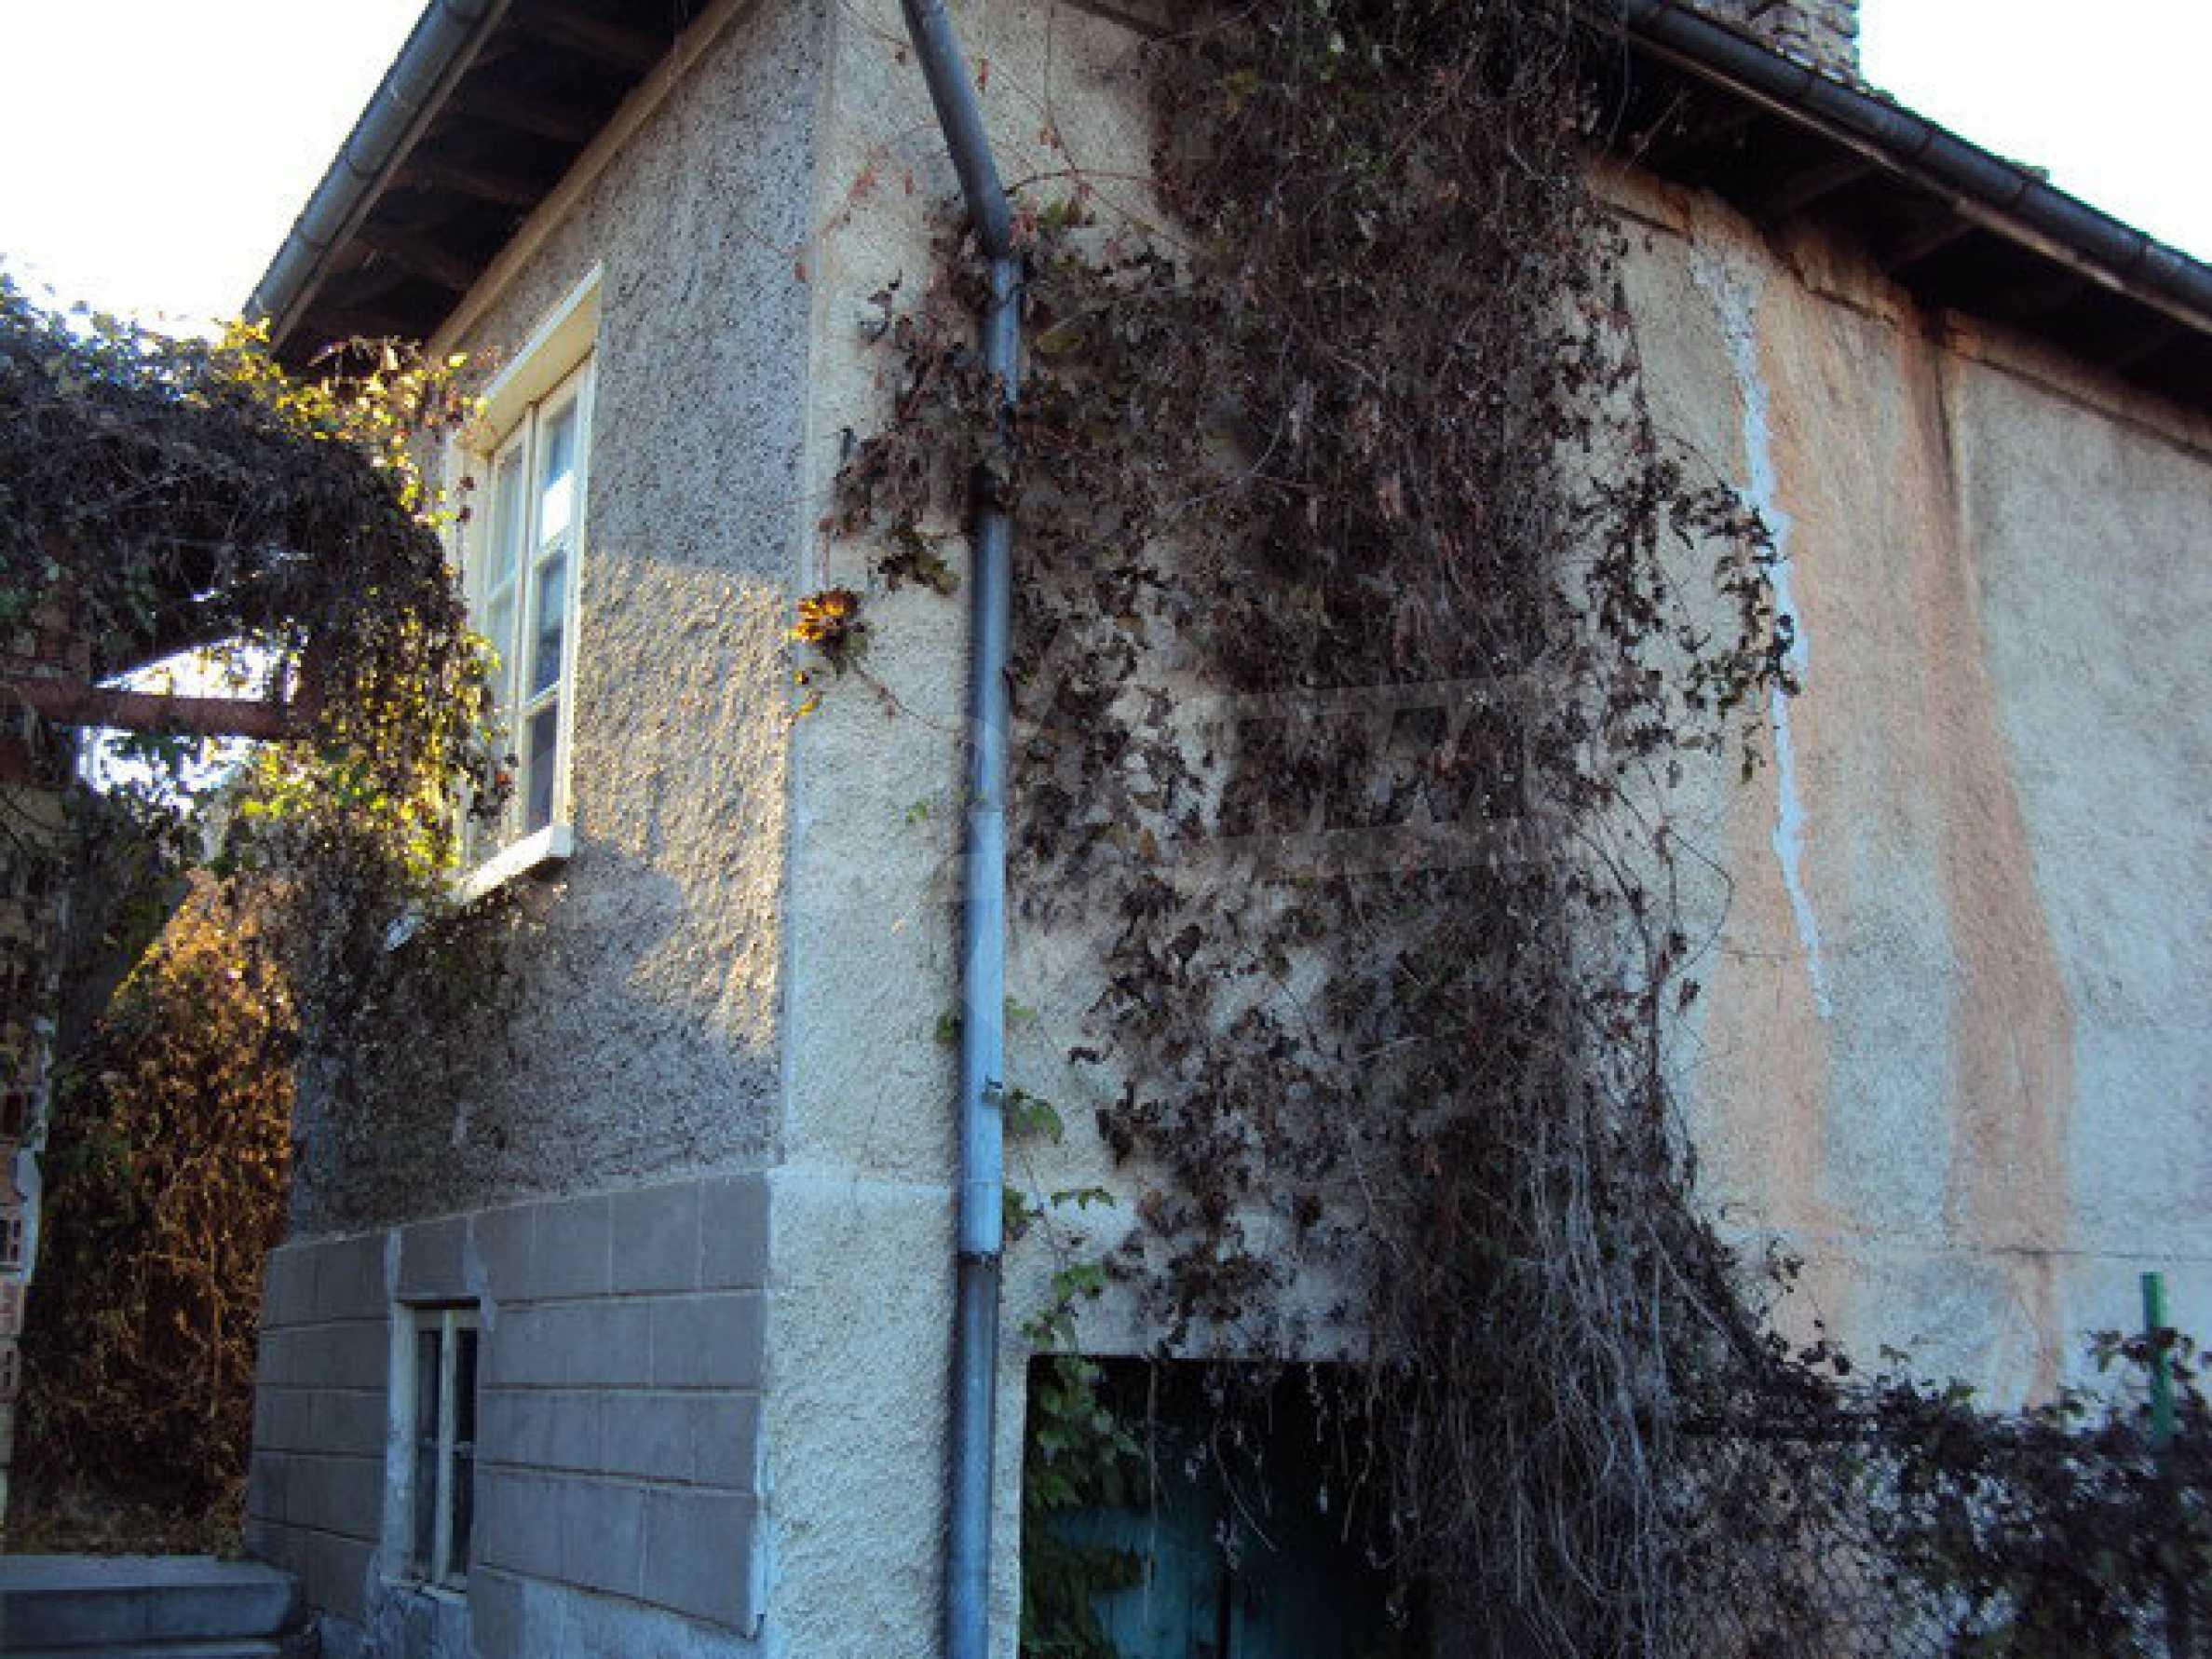 House with garden 25 km away from Veliko Tarnovo 1